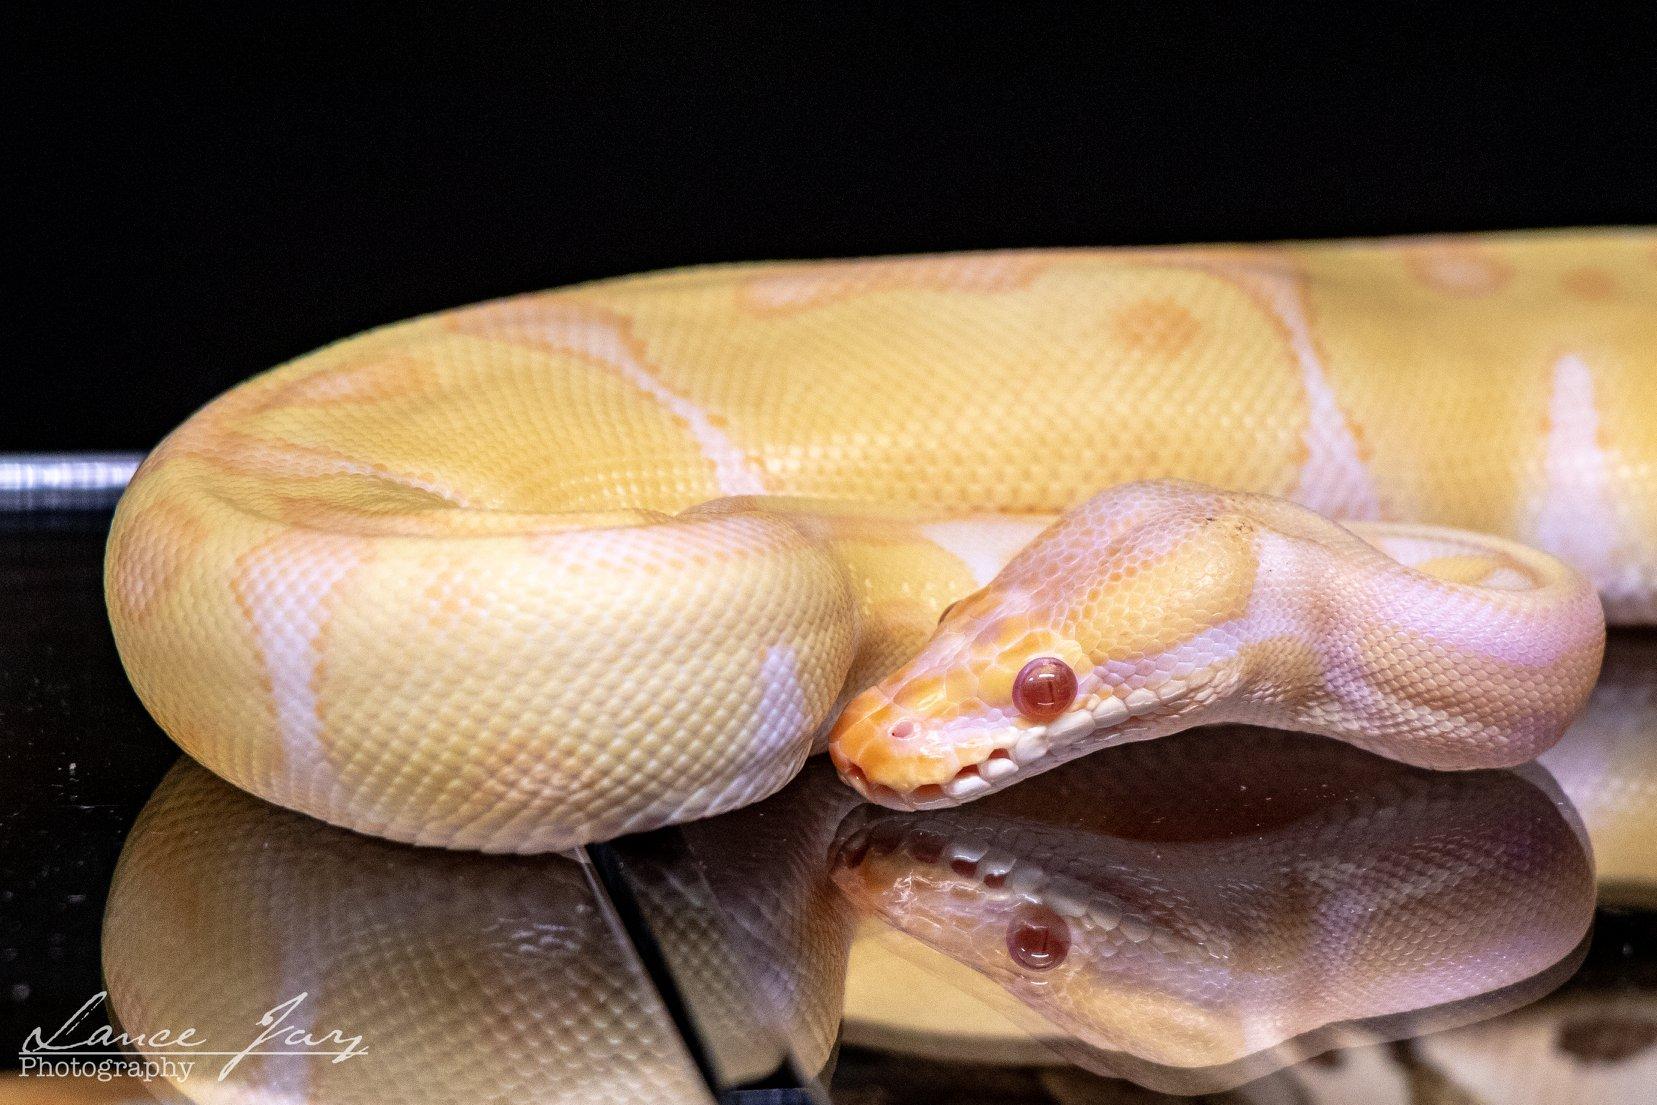 Home | Mid-Atlantic Reptile Expo